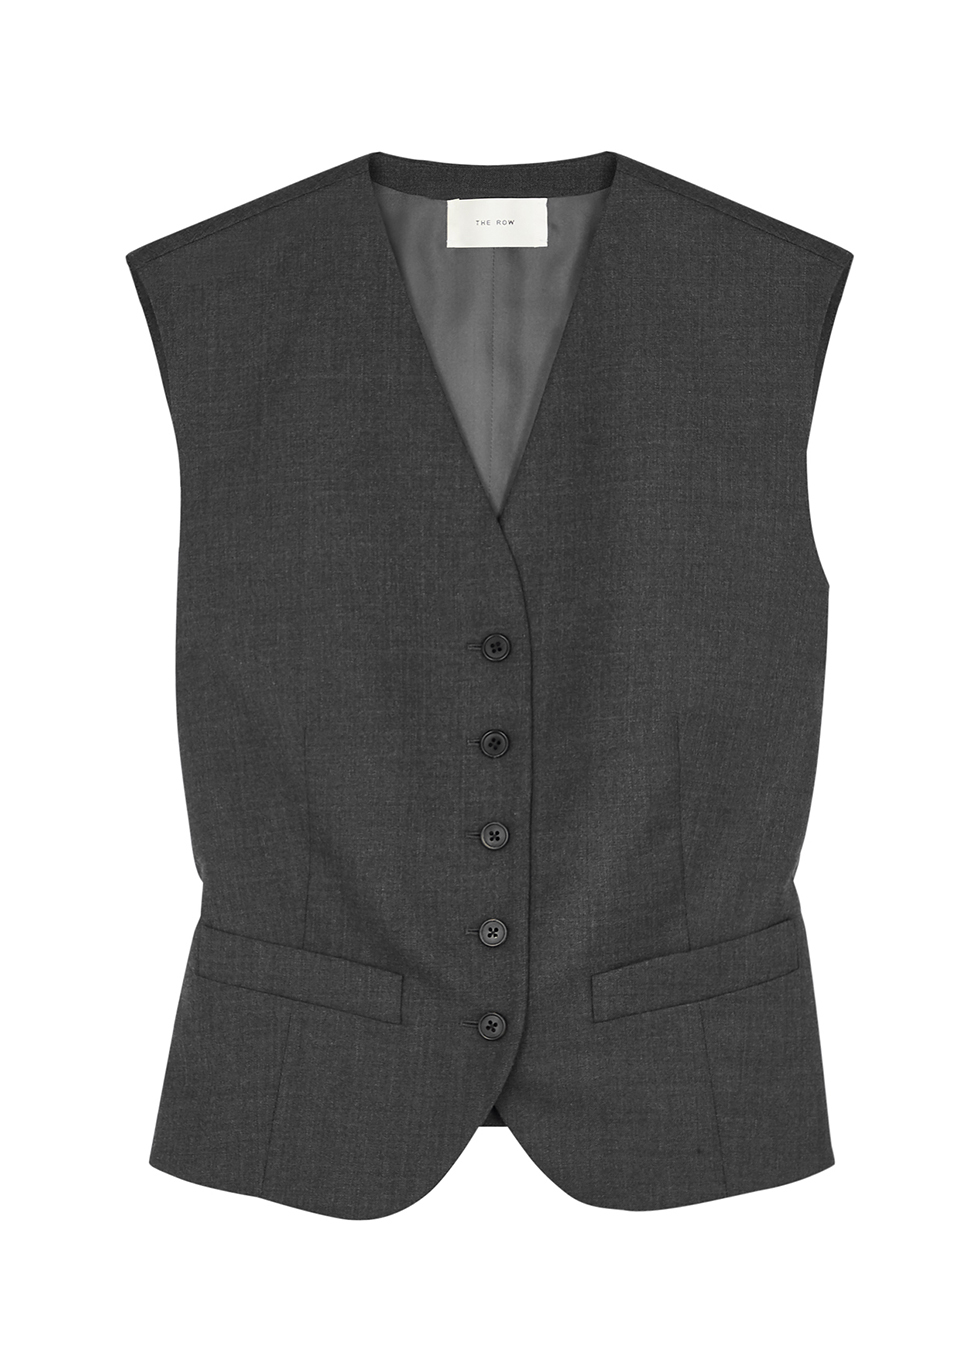 Vega dark grey wool waistcoat